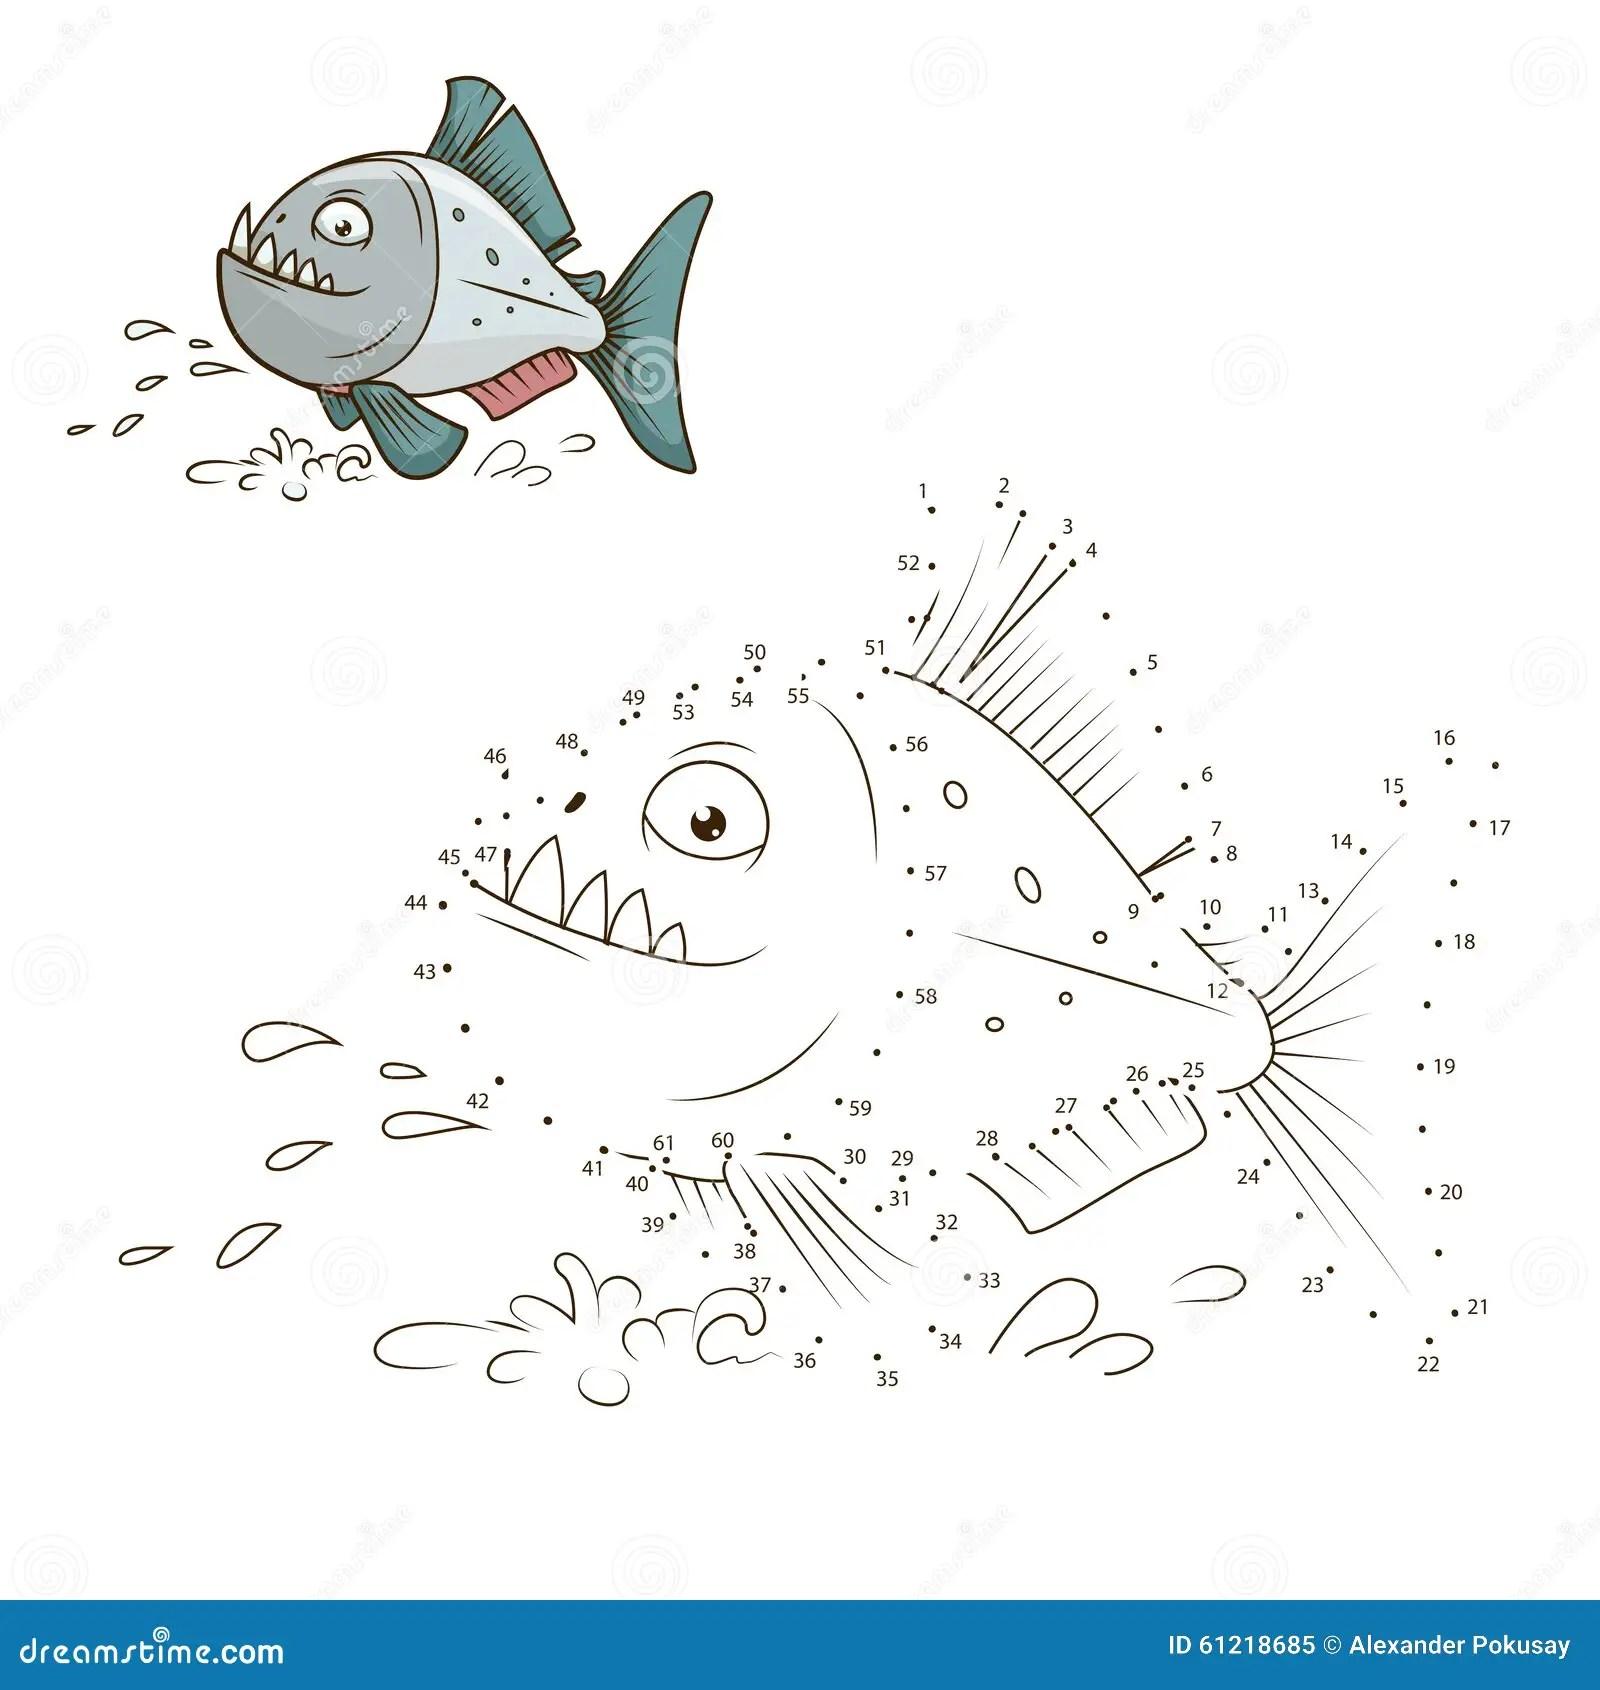 Draw The Animal Piranha Educational Game Vector Stock